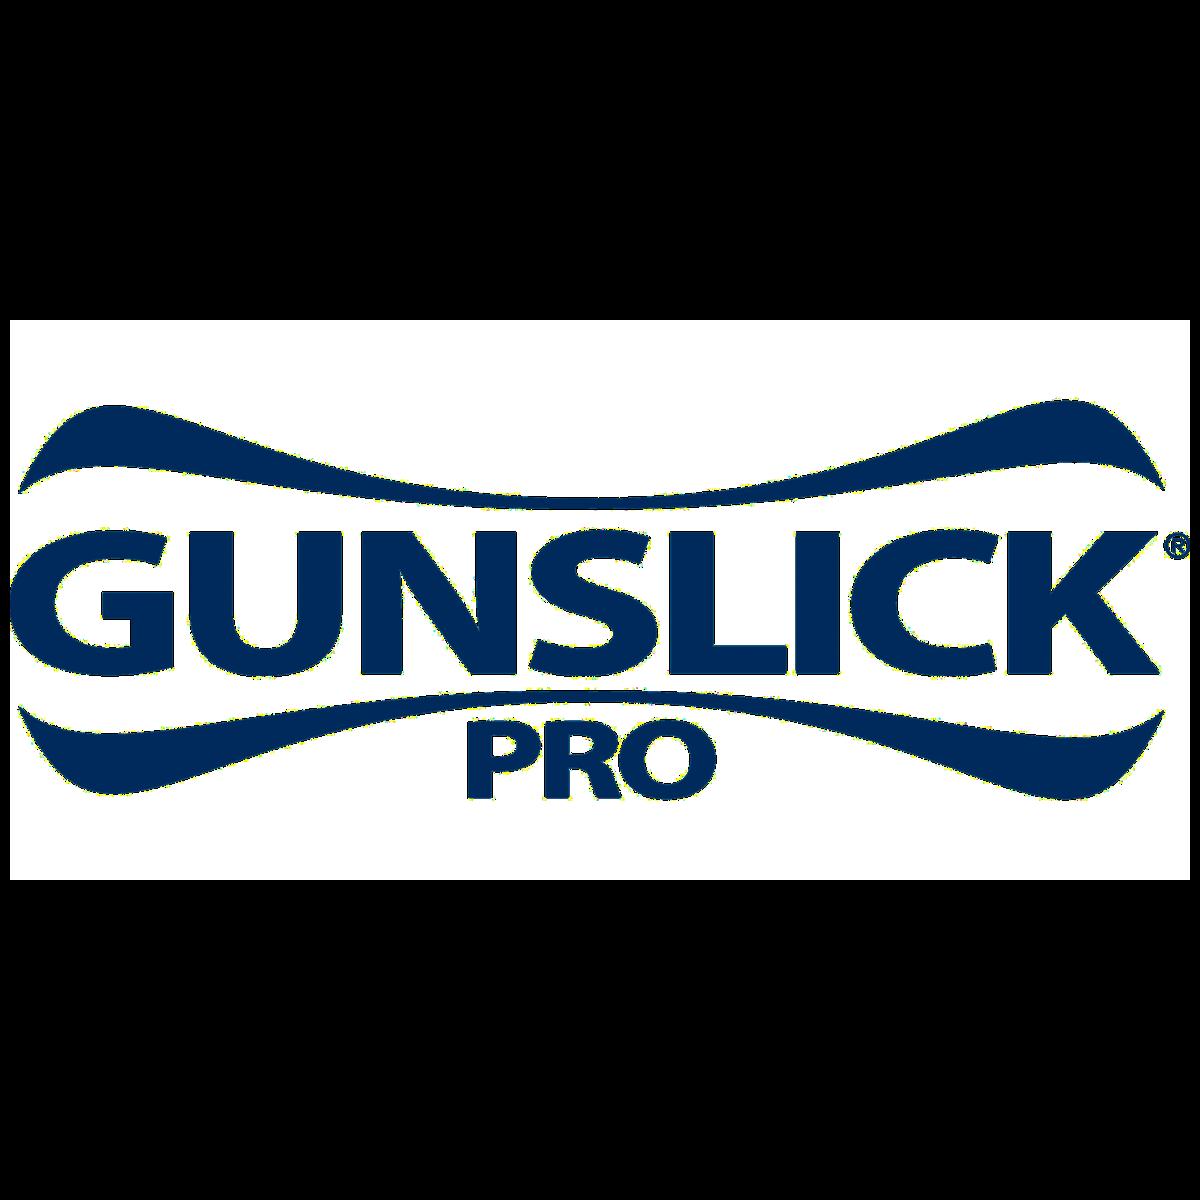 GUNSLICK